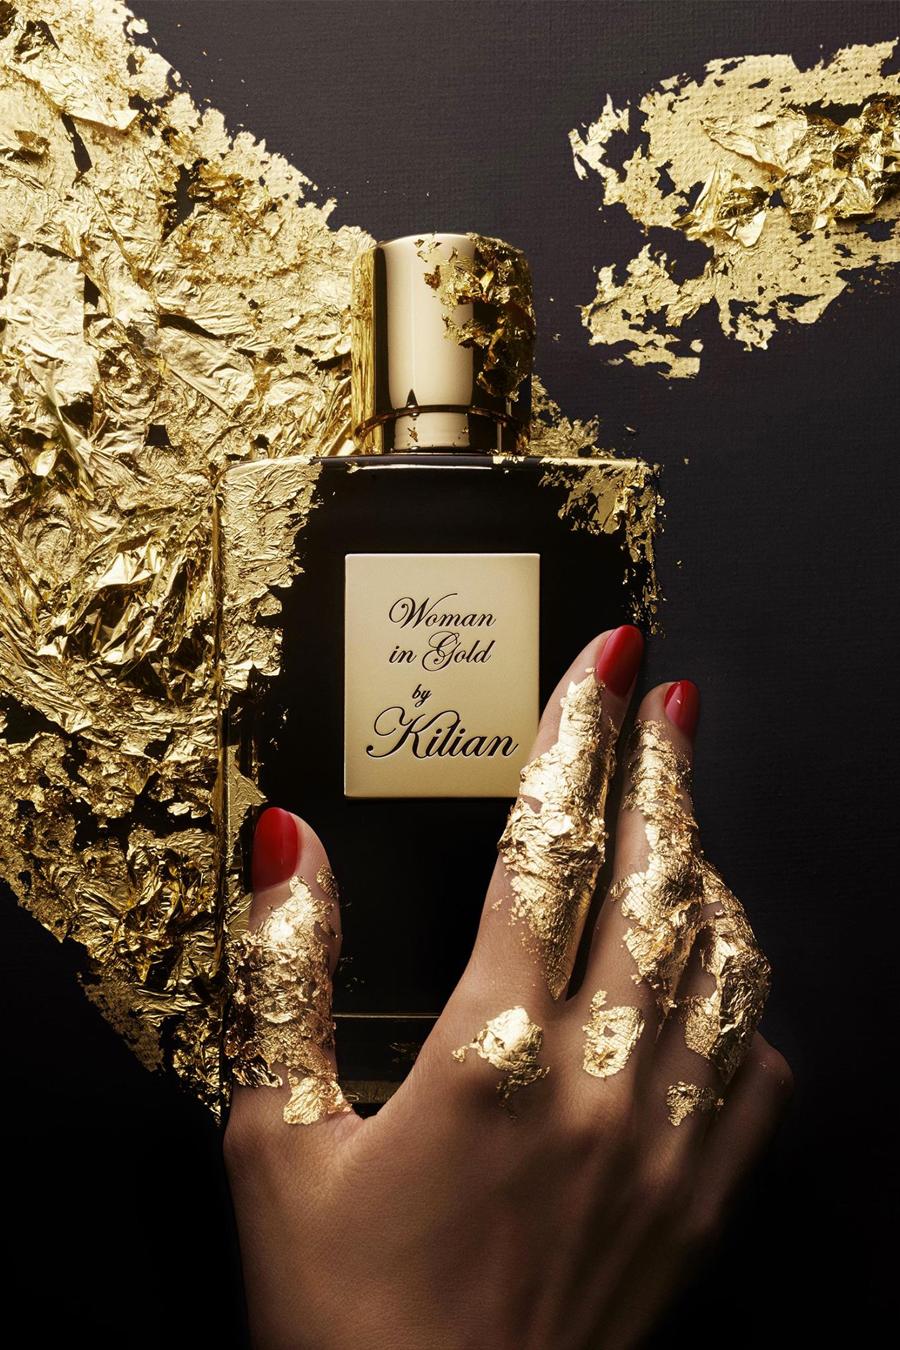 WOMAN IN GOLD BY KILIAN PERFUME